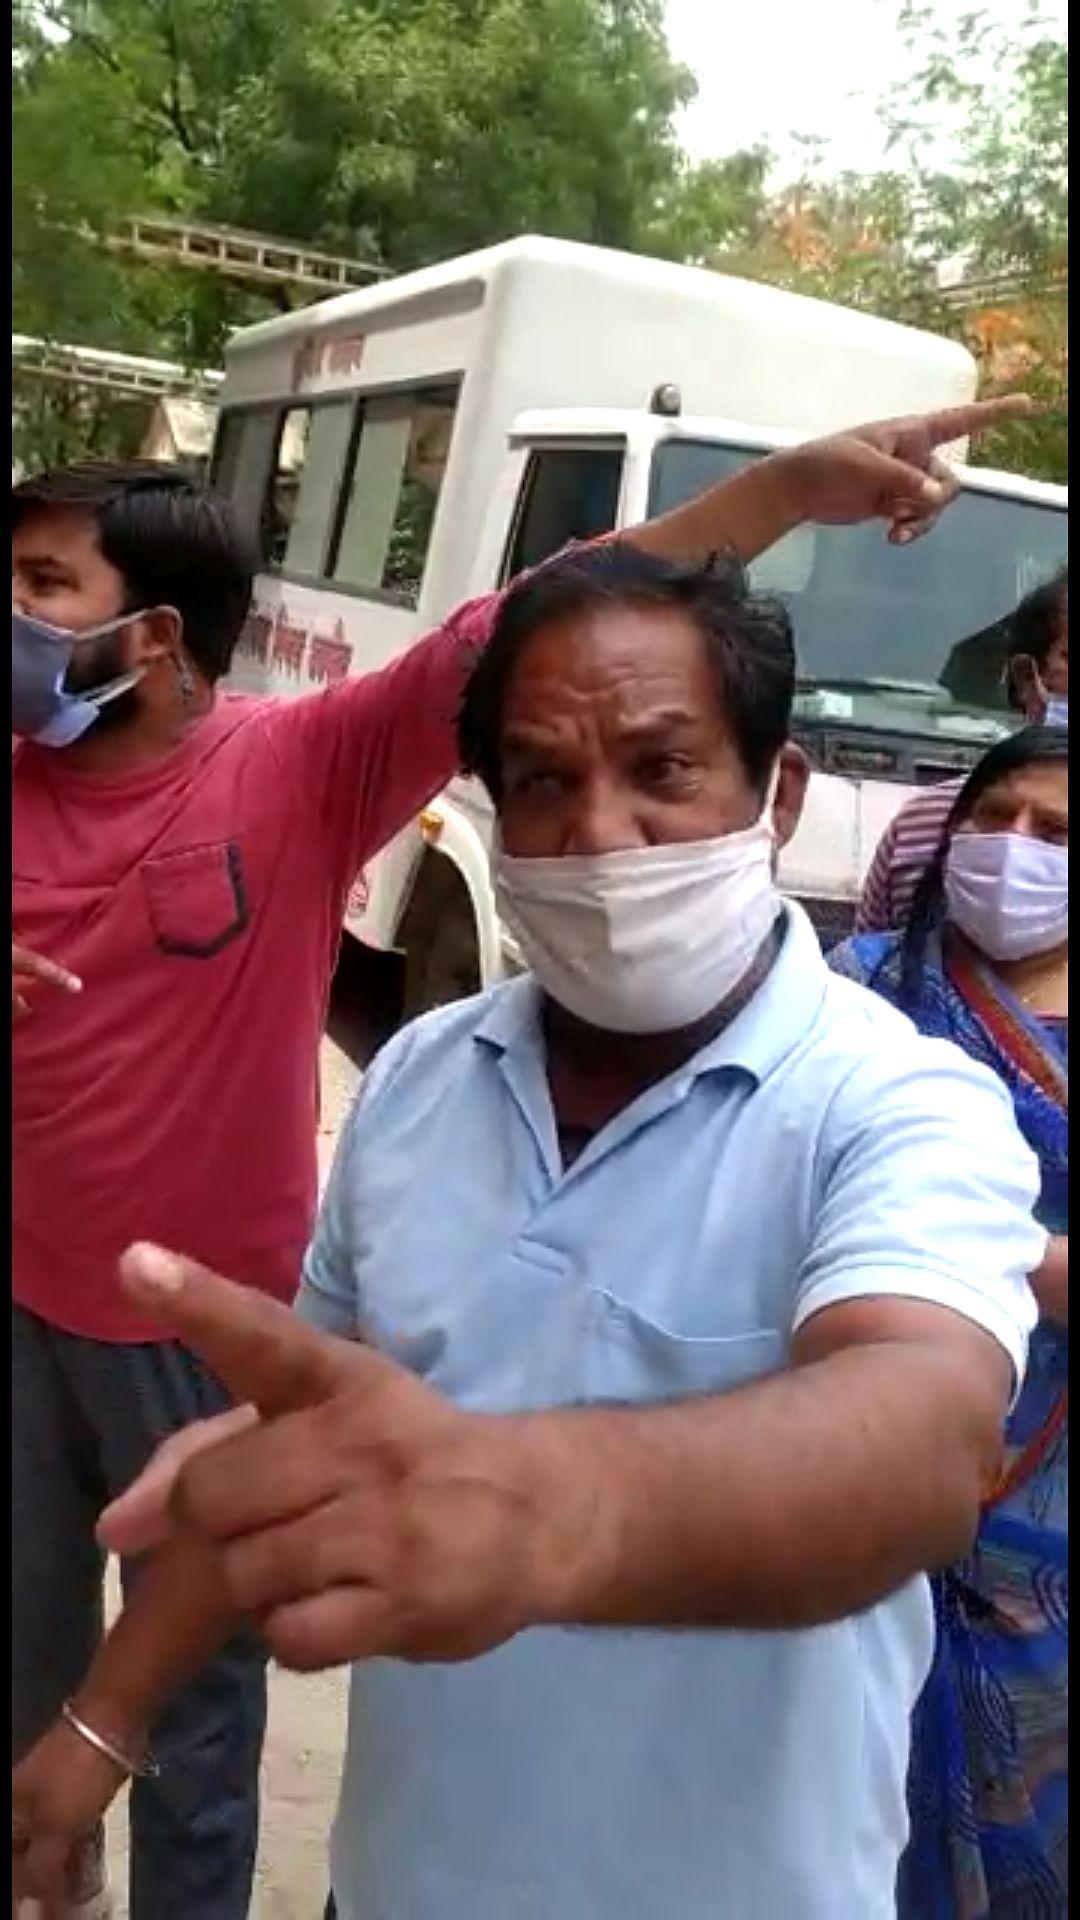 Ujjain: Ruckus at RDGMC; 'Doctors' get away with thrashing cop